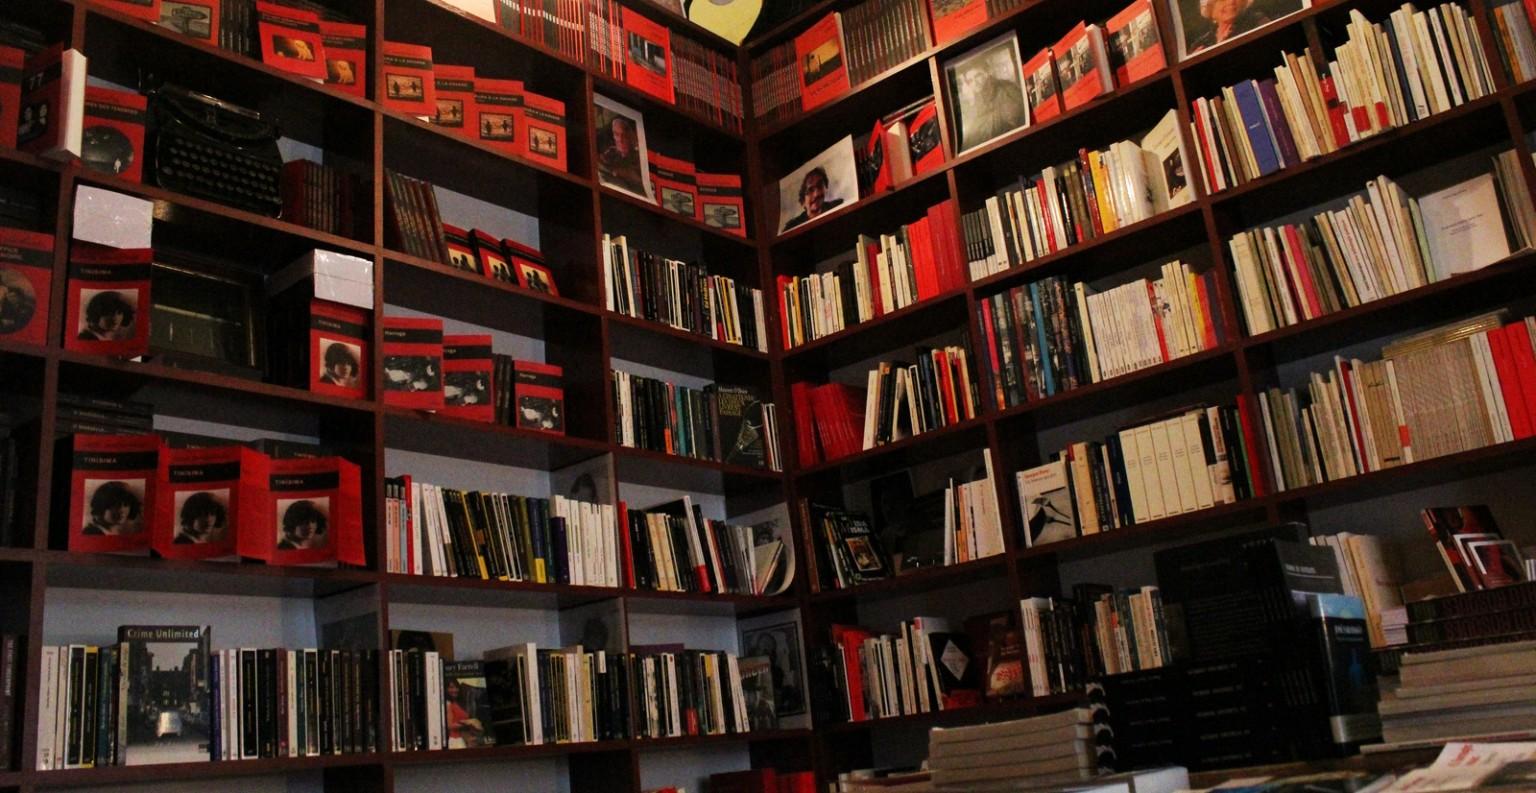 La librairie L'atinoir, située au 4 rue Barbaroux à Marseille. ©DF